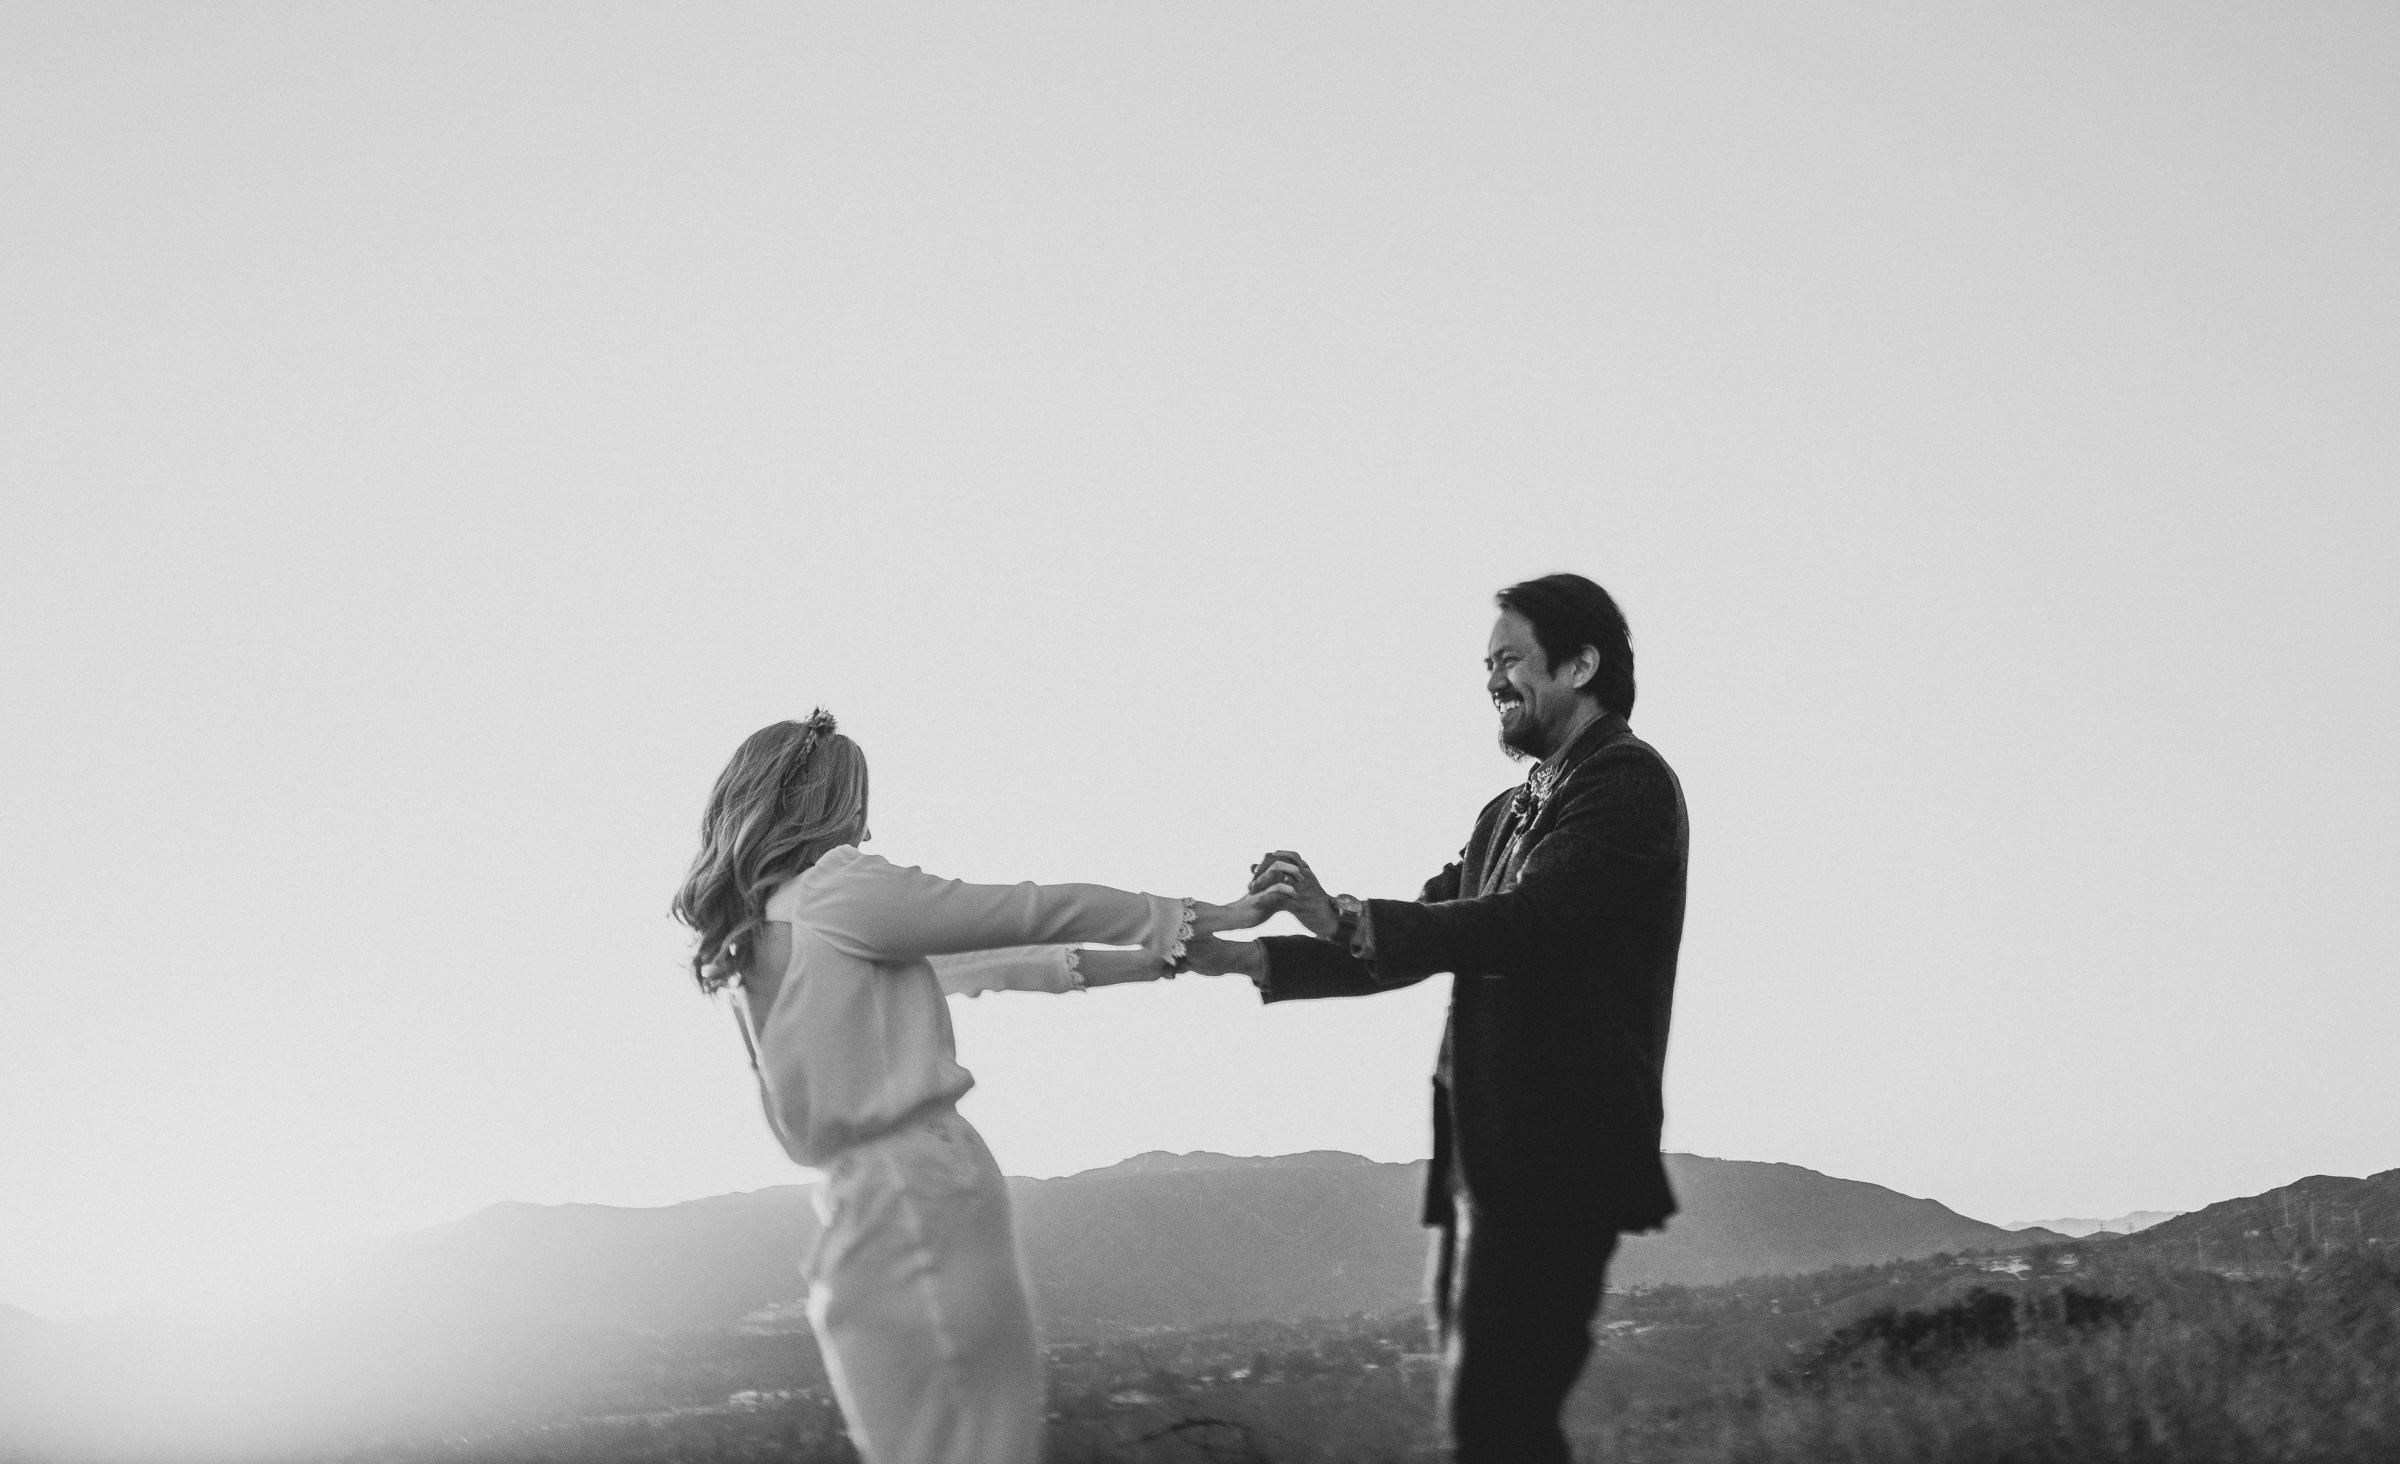 ©Isaiah + Taylor Photography - Intimate Elopement, Eaton Canyon, Los Angeles Wedding Photographer-103.jpg